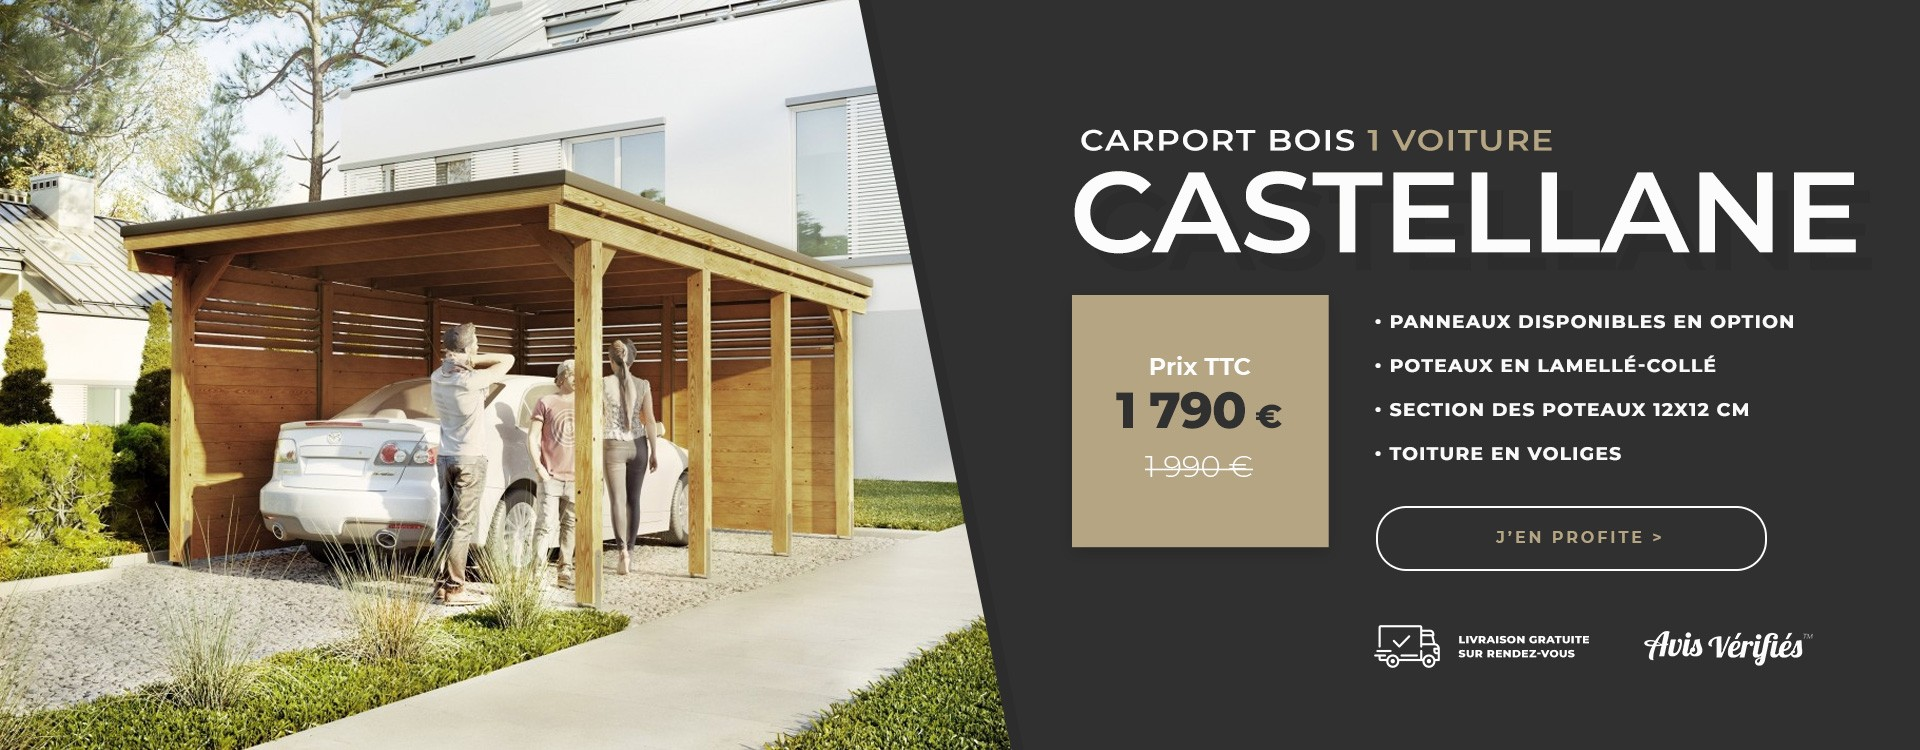 carport bois castellane